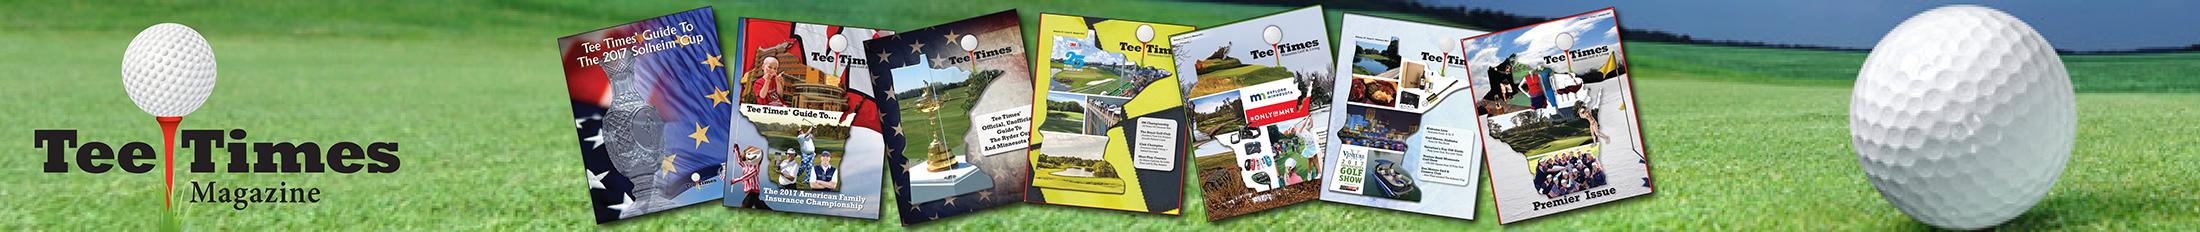 Tee Times Magazine